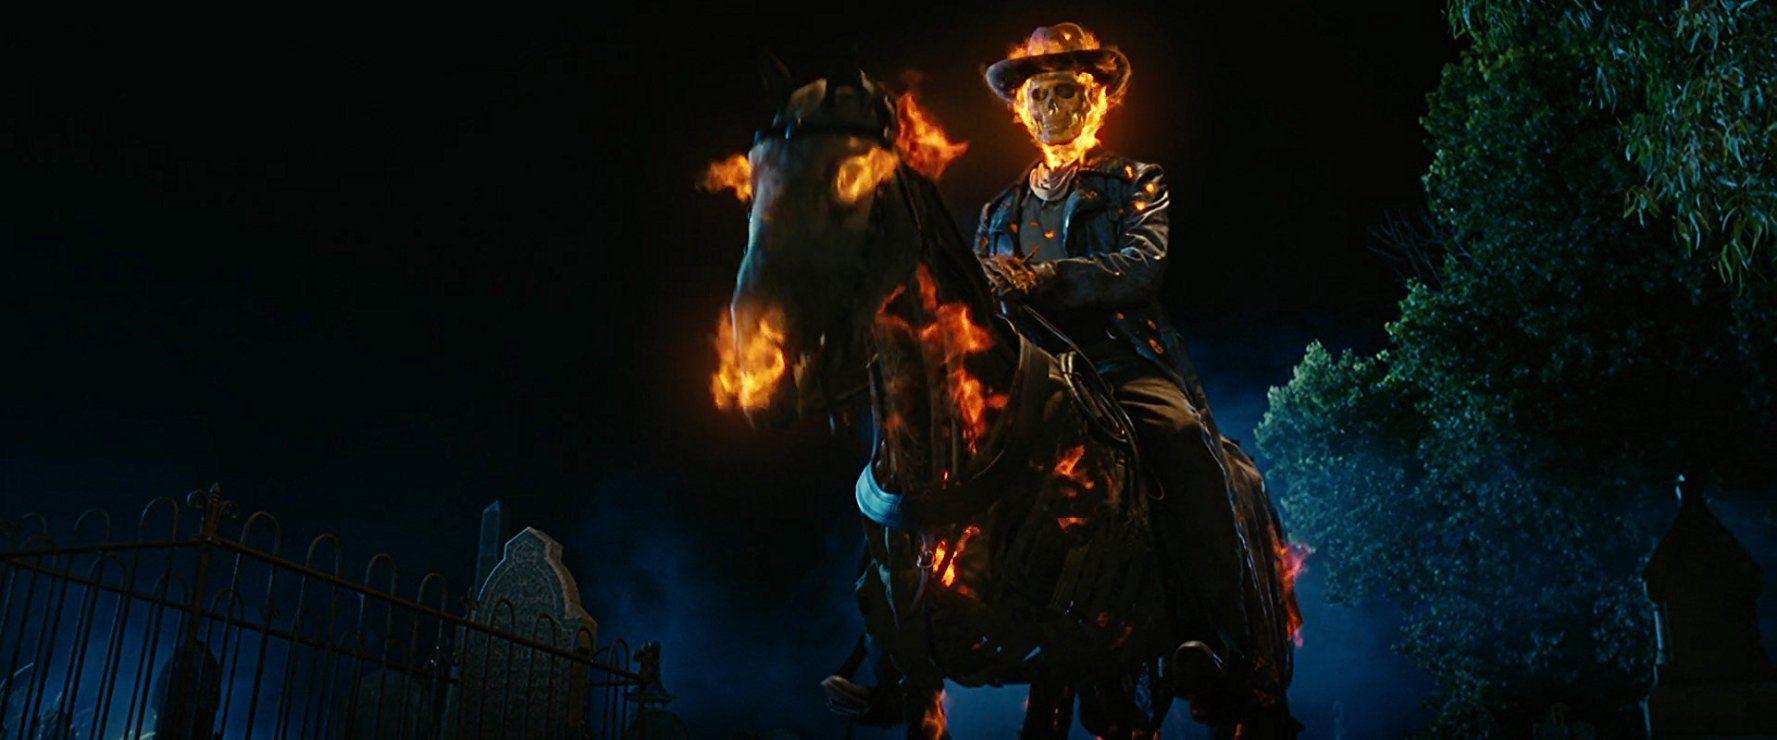 Ghost Rider (2007) - Photo Gallery - IMDb In 2019